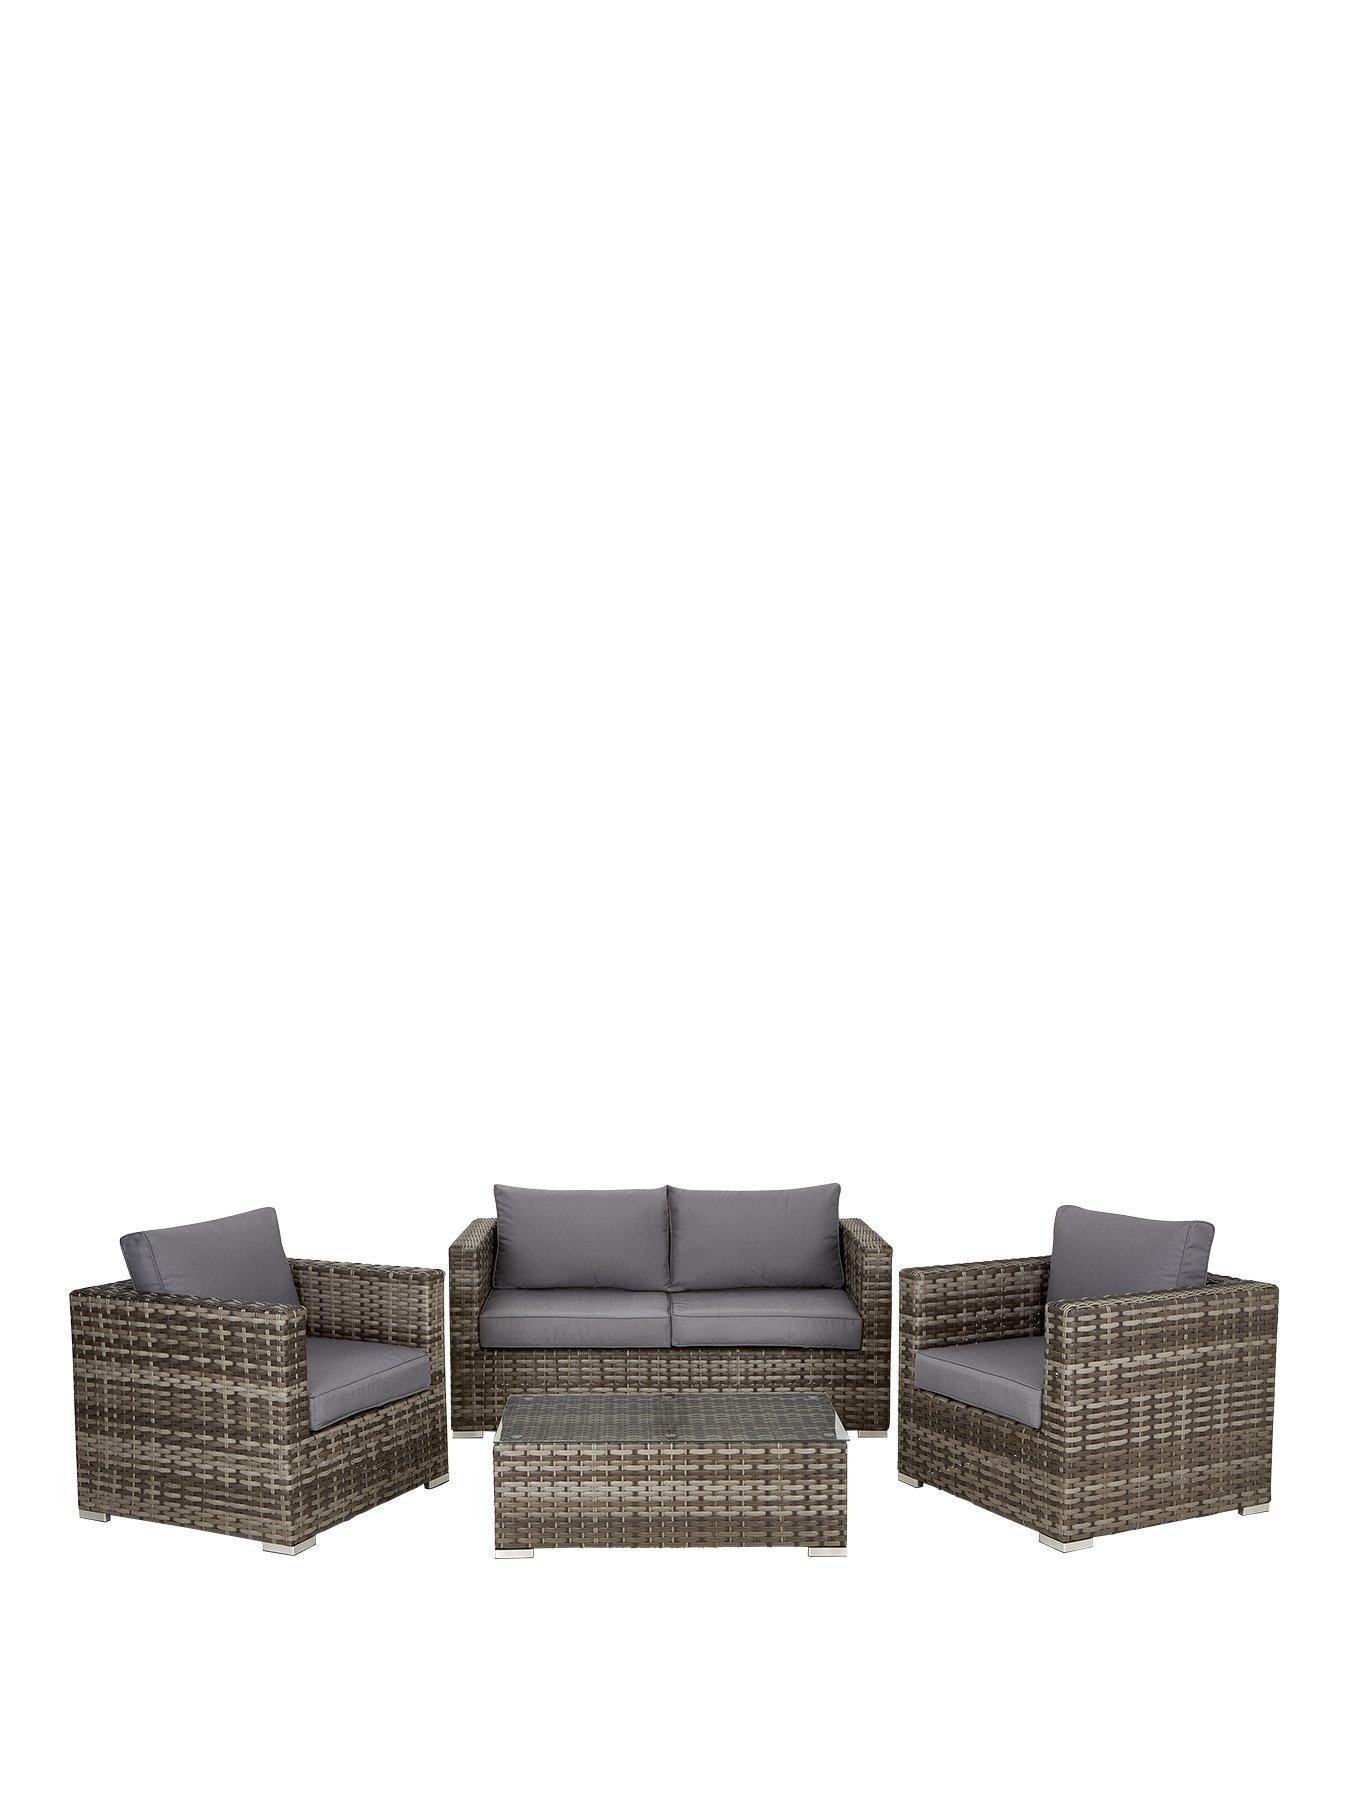 Aruba 4 Seater Sofa Set